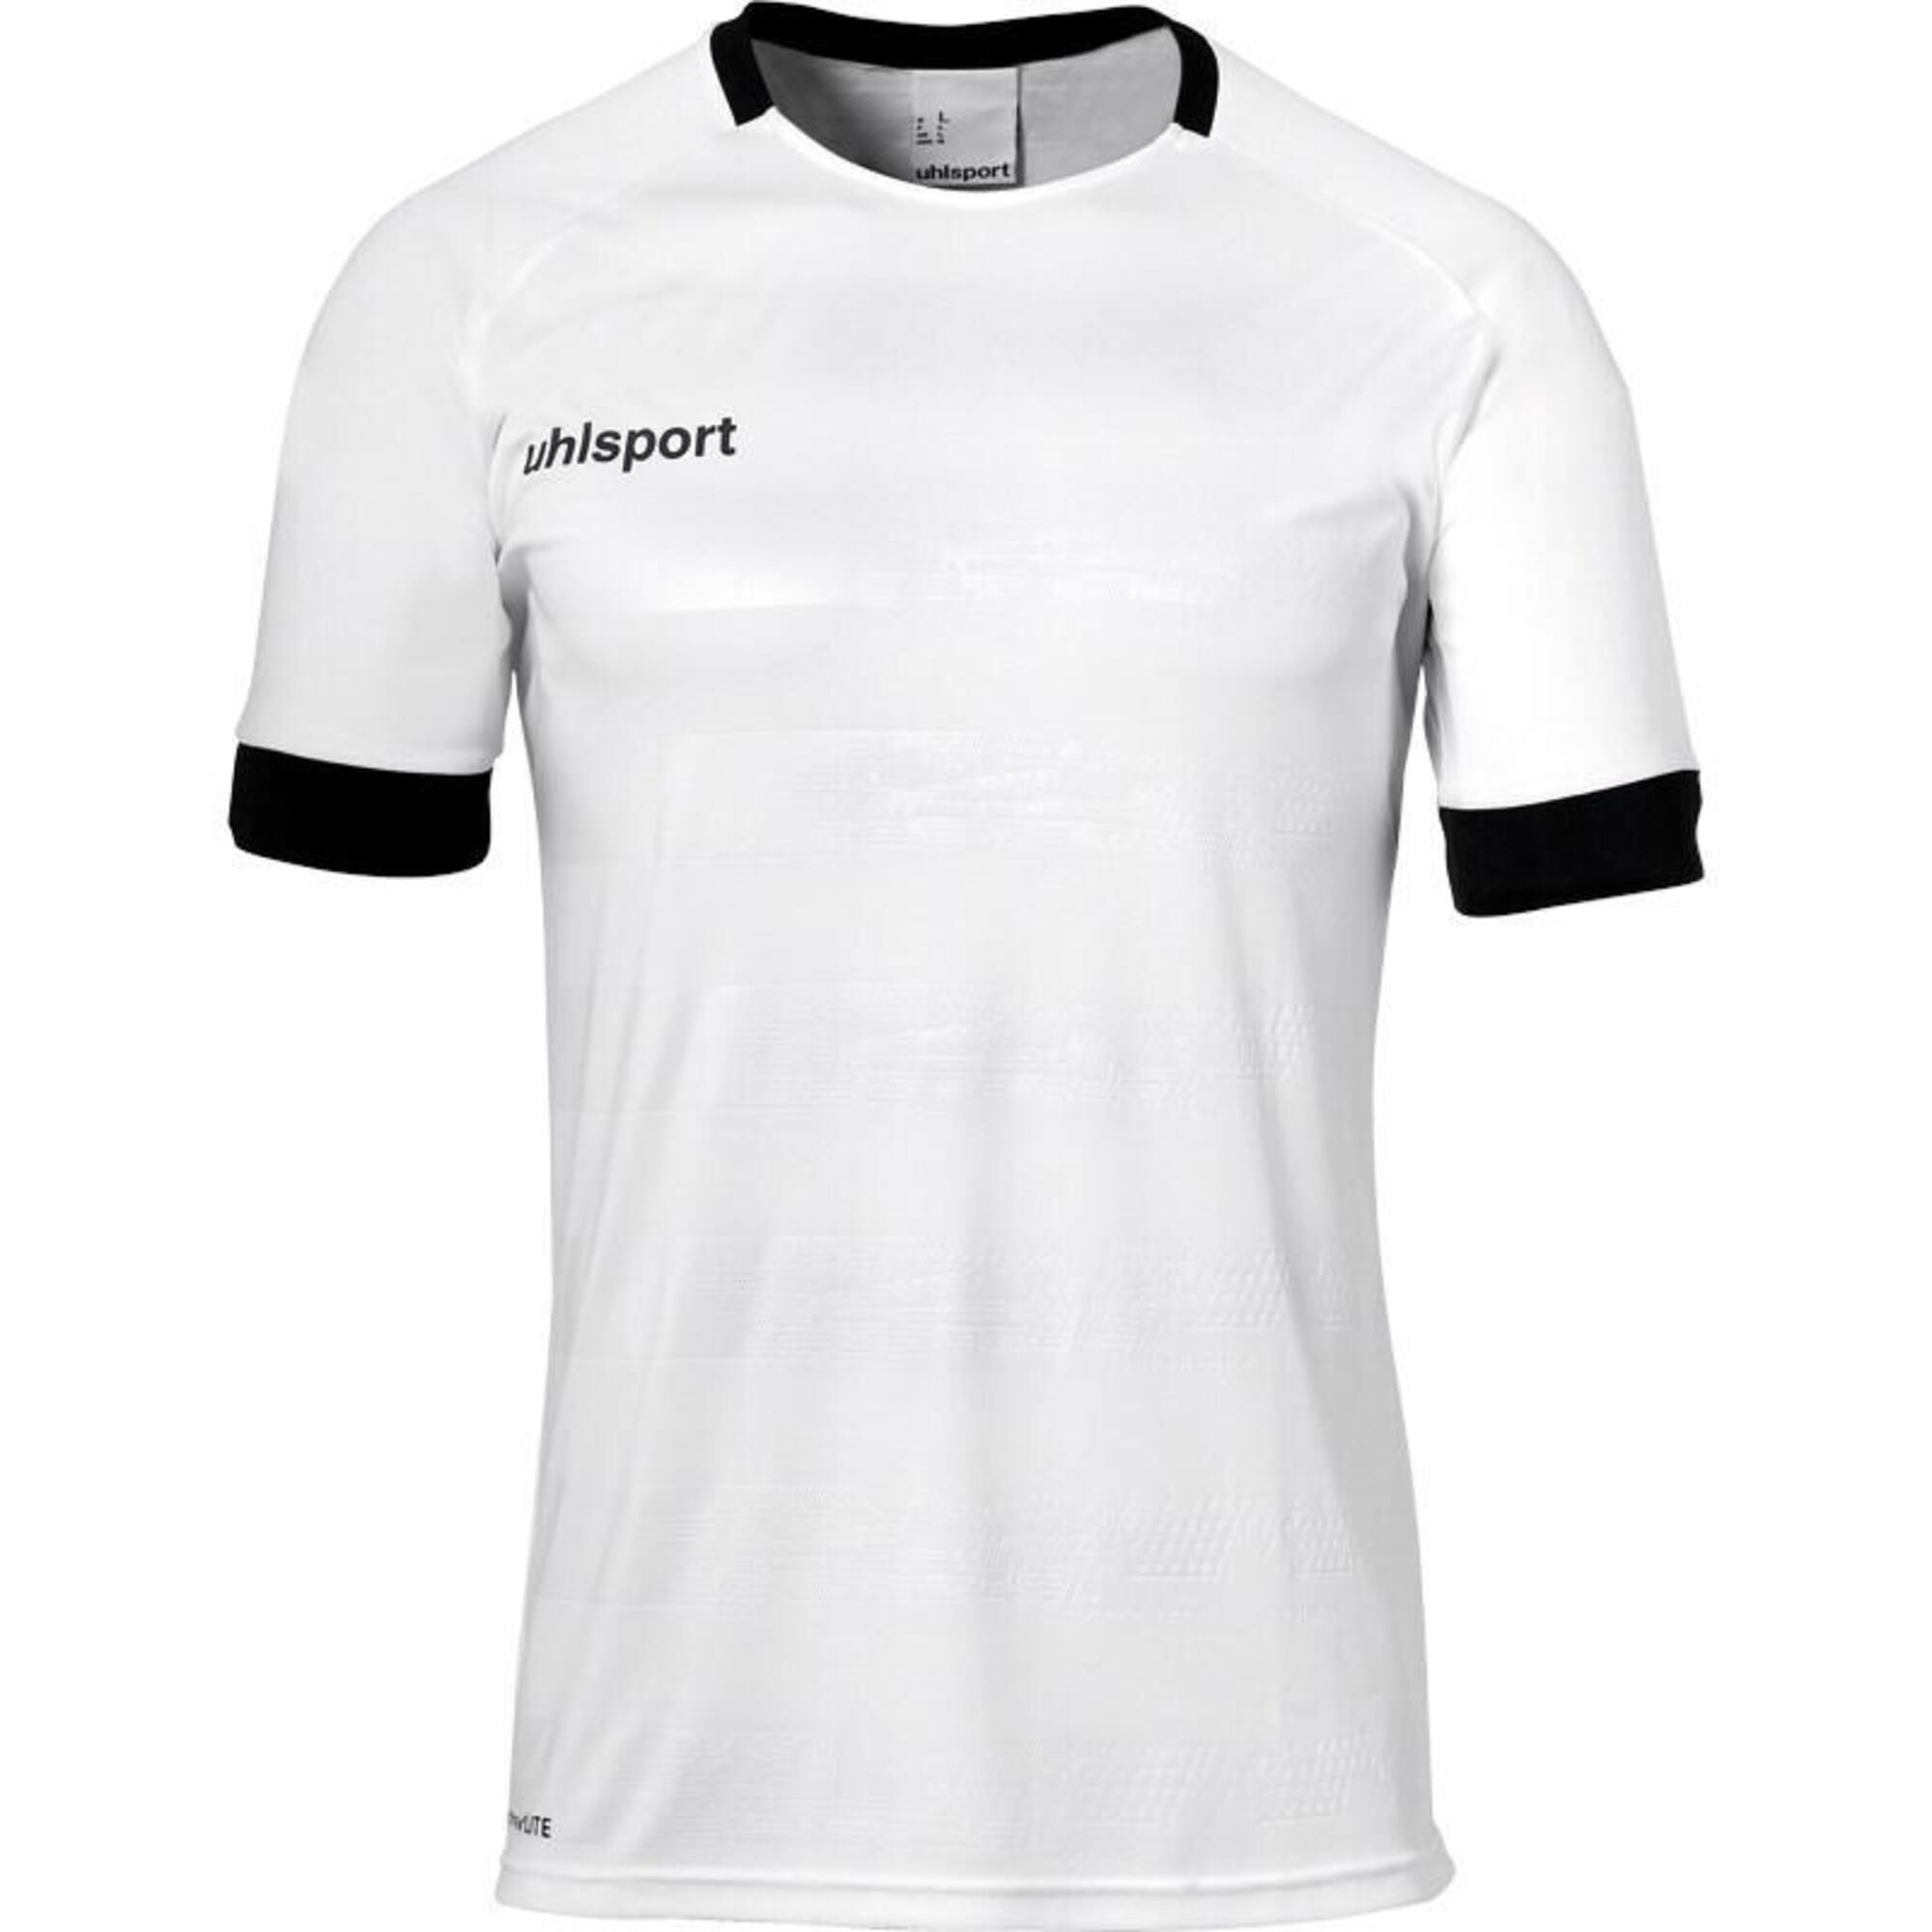 Maillot Uhlsport Division 2.0